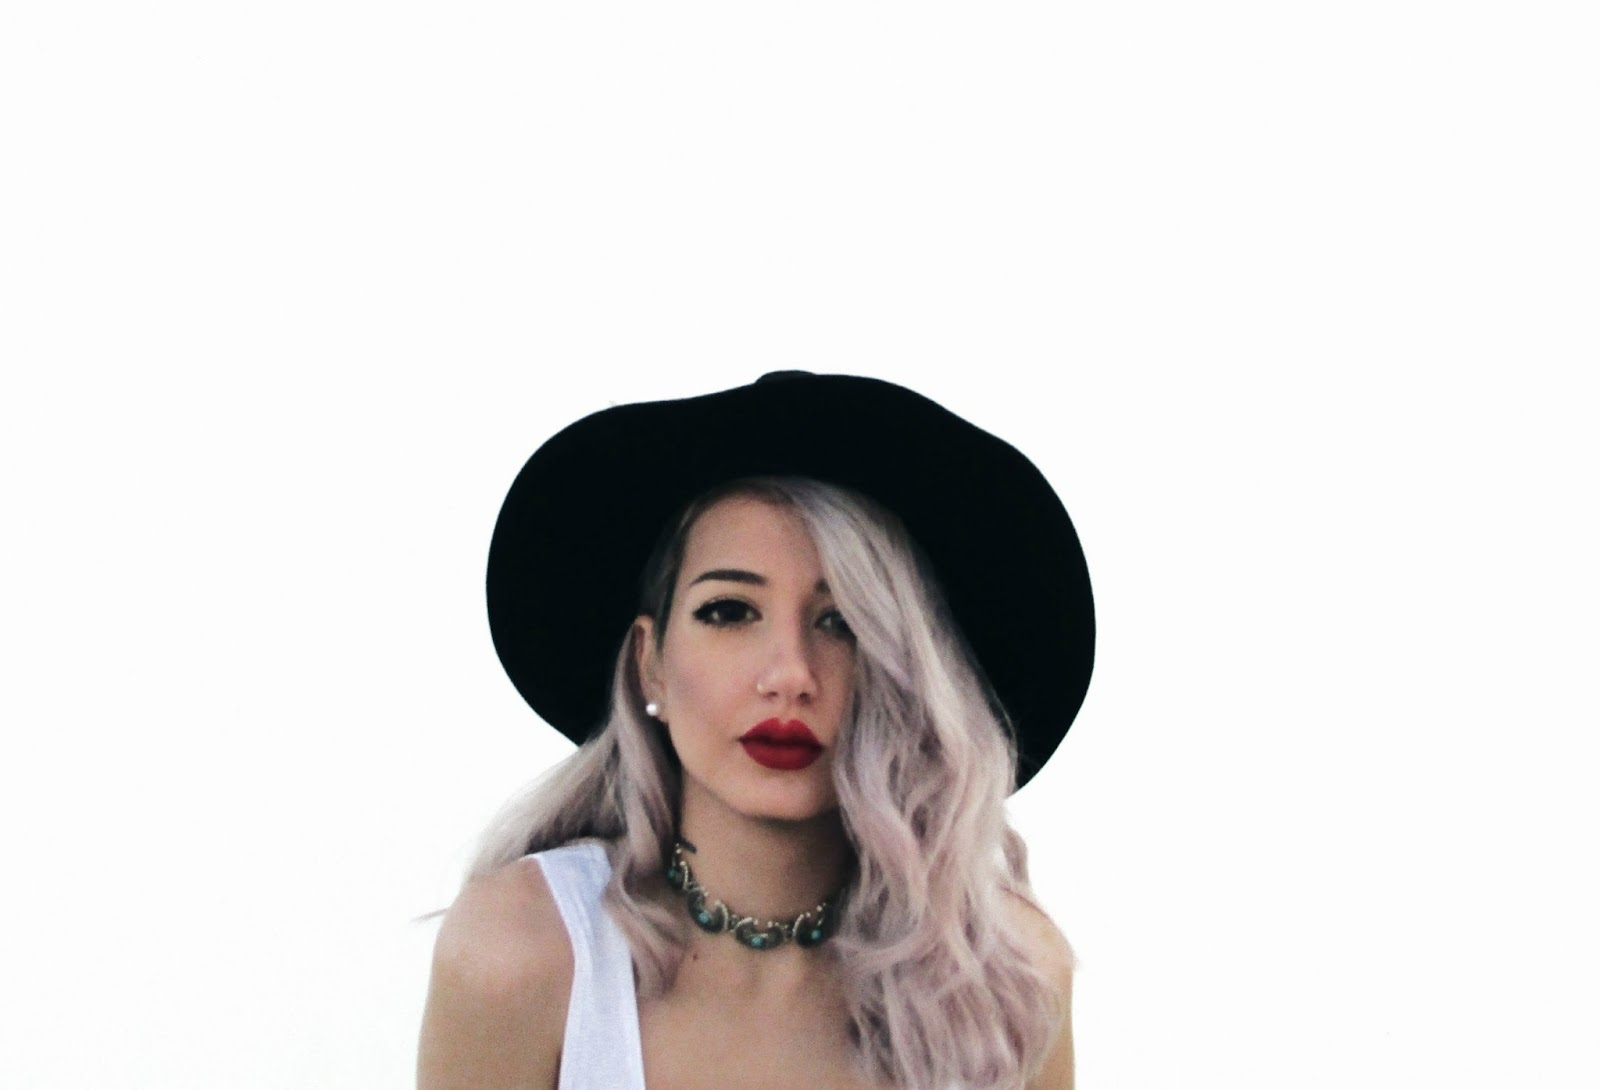 venetia kamara fashion blogger